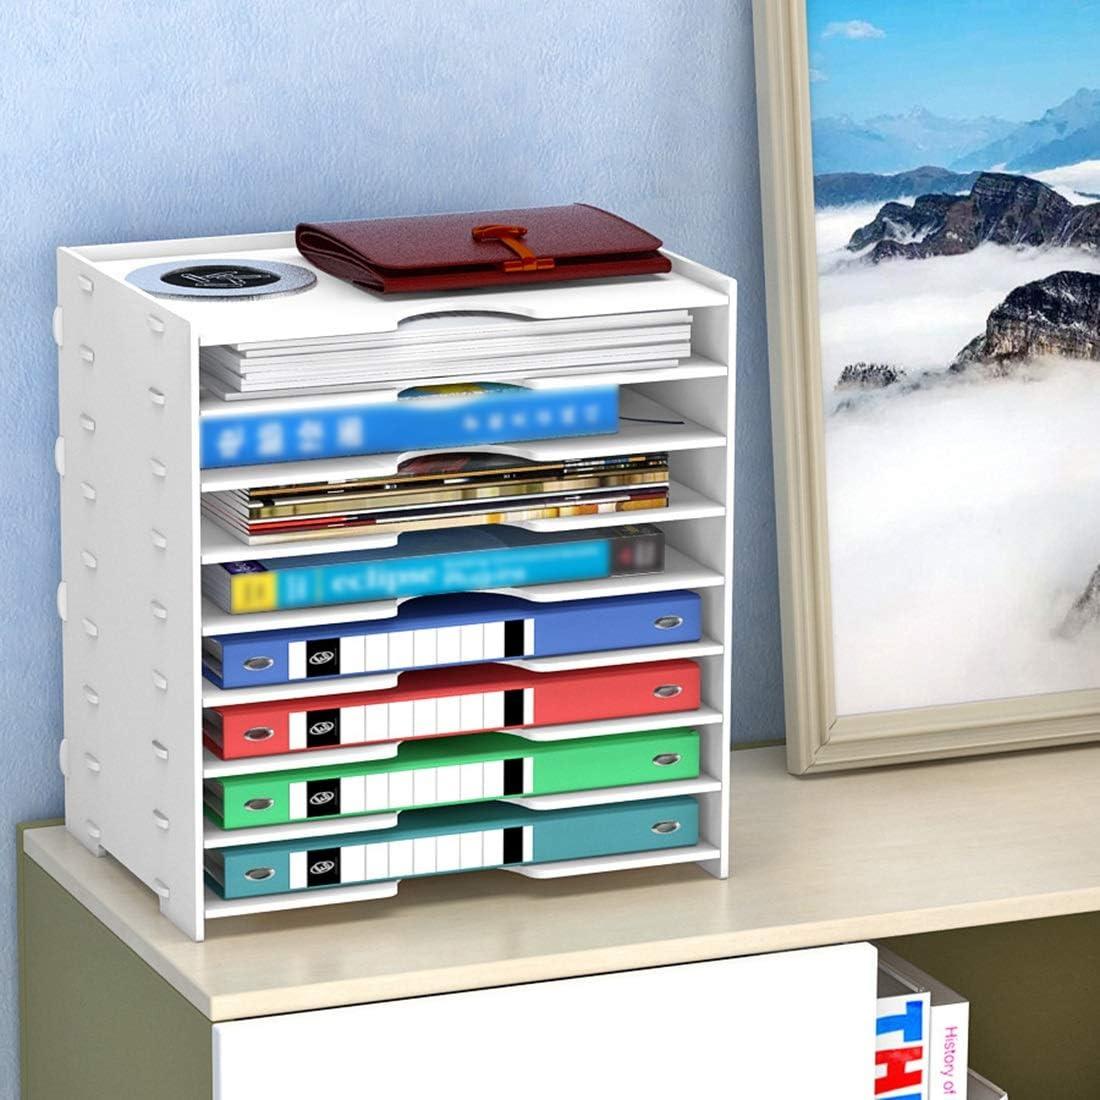 FELICIPP Dossiers Bo/îtes de Stockage Multicouches Racks de Bureau Color : Eight